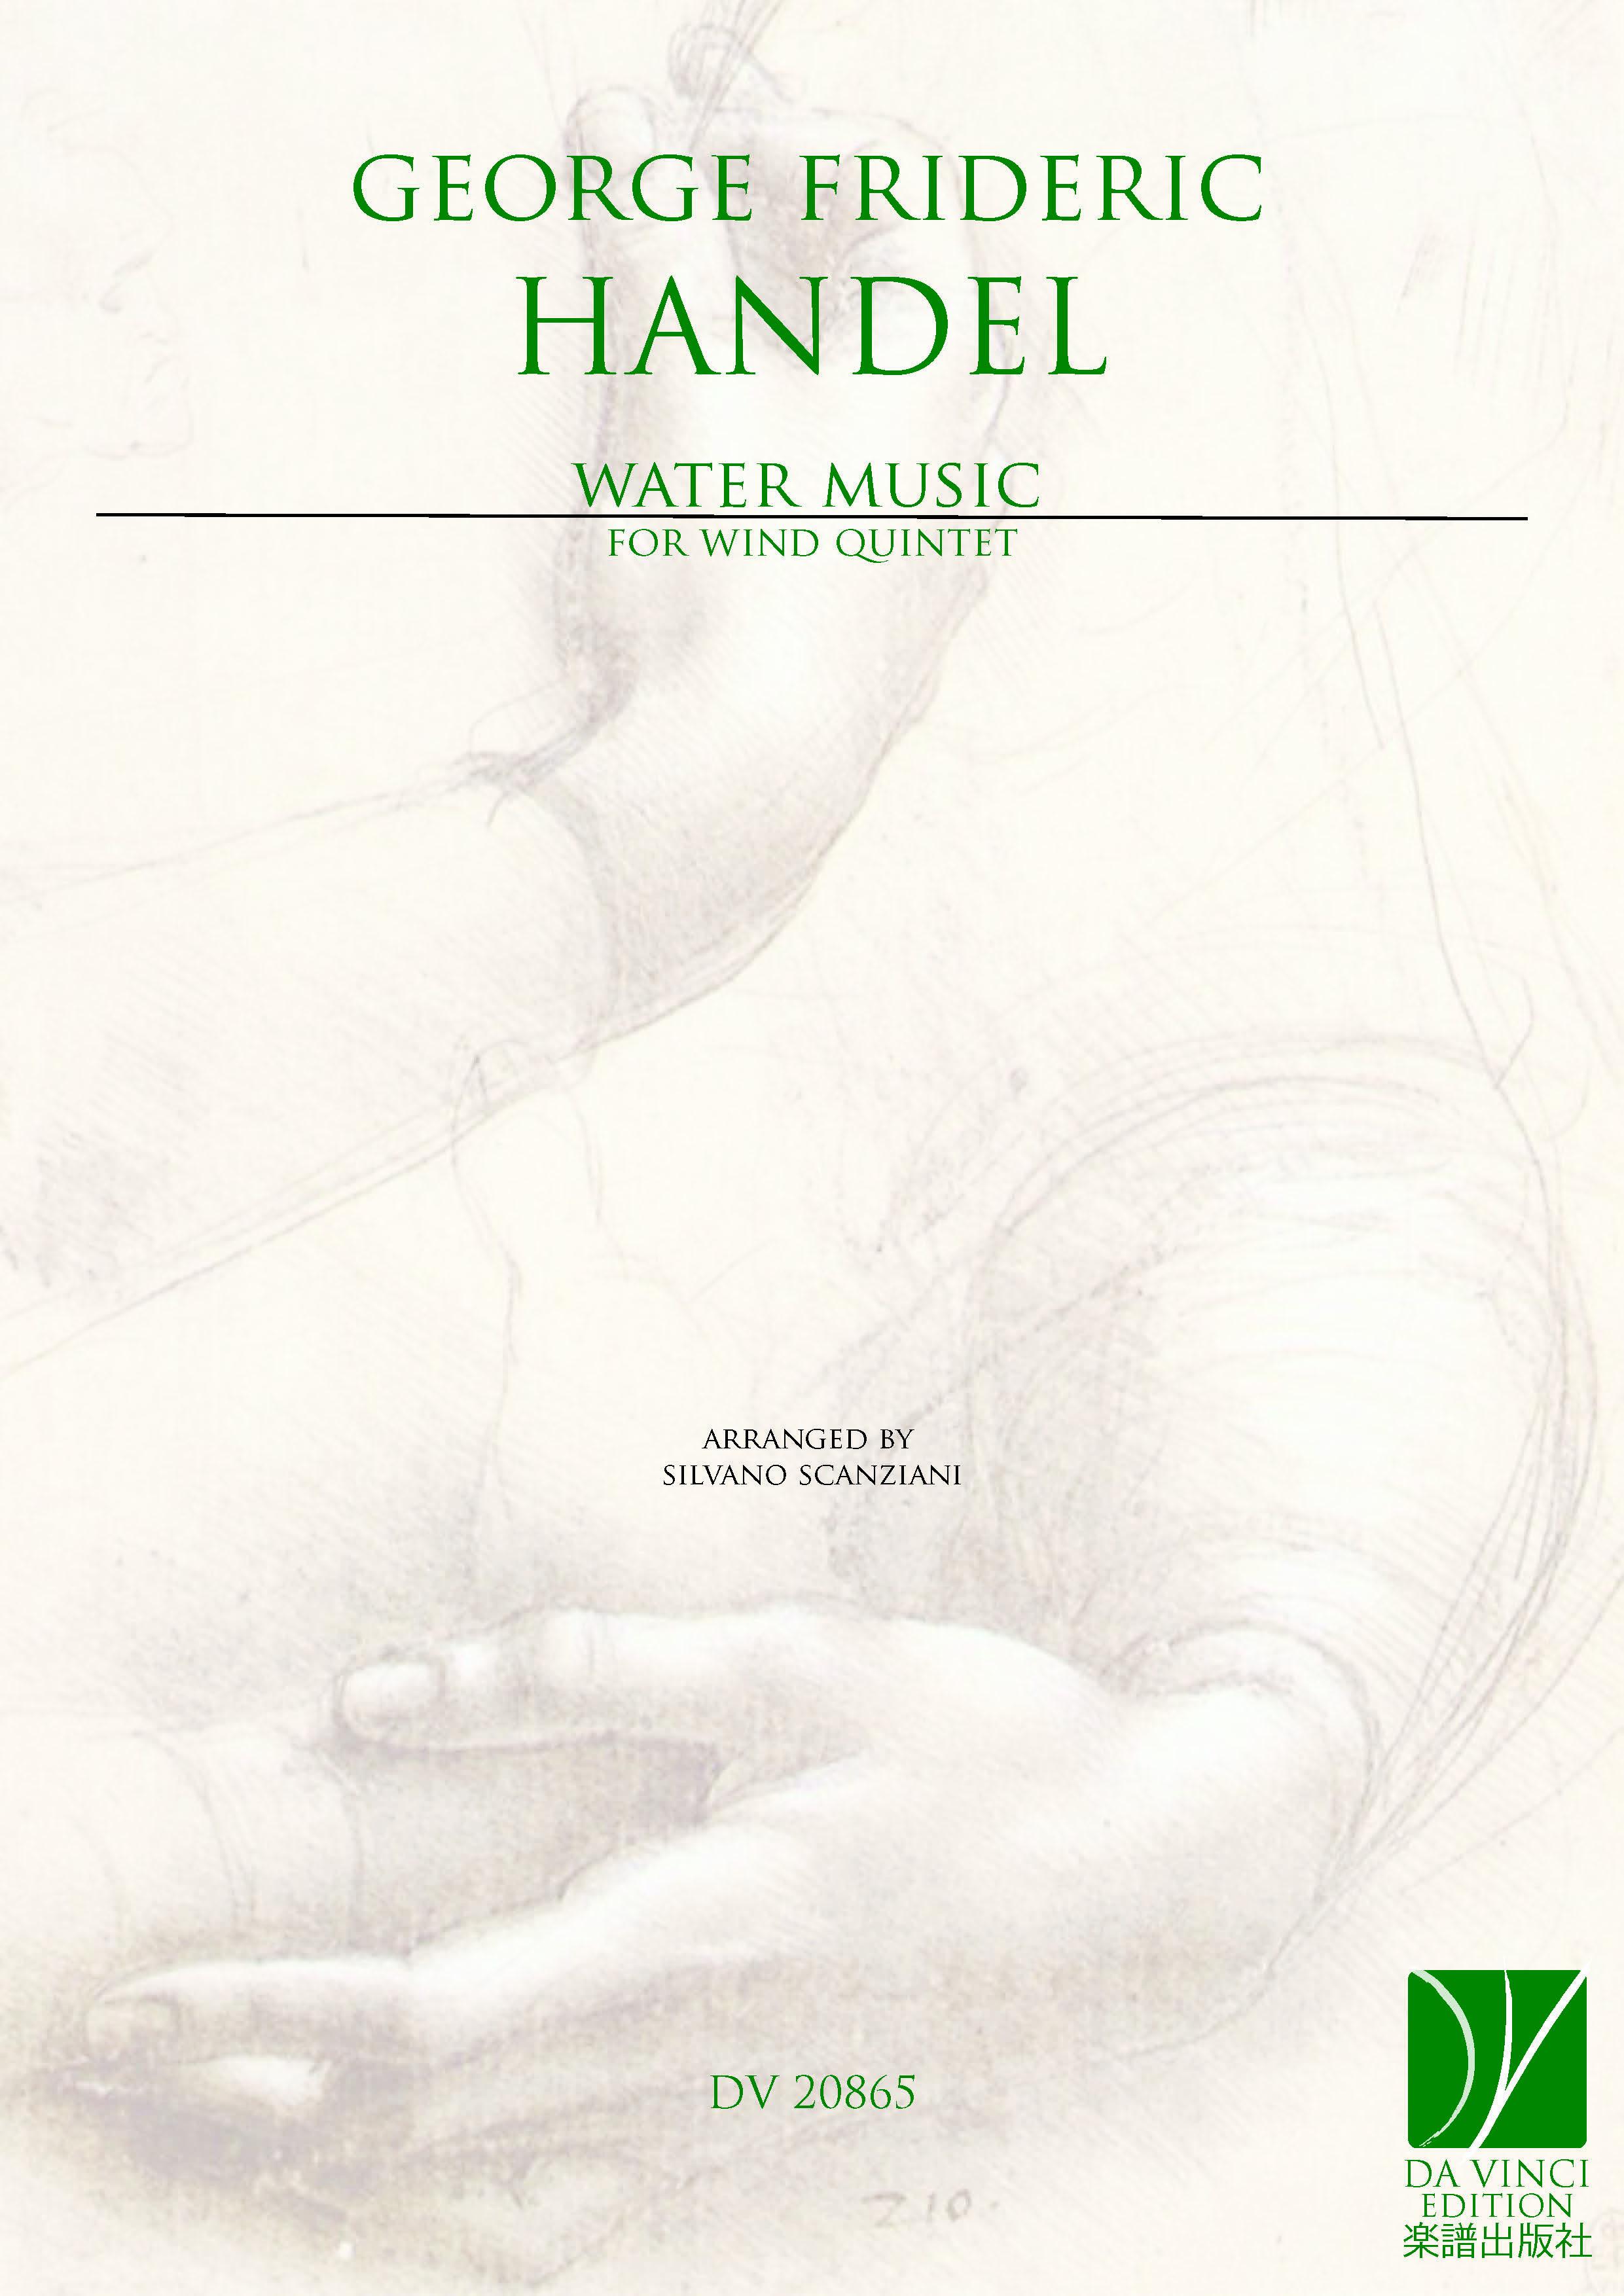 Handel, Georg Frideric: Water Music, for Wind Quintet – DA VINCI ...